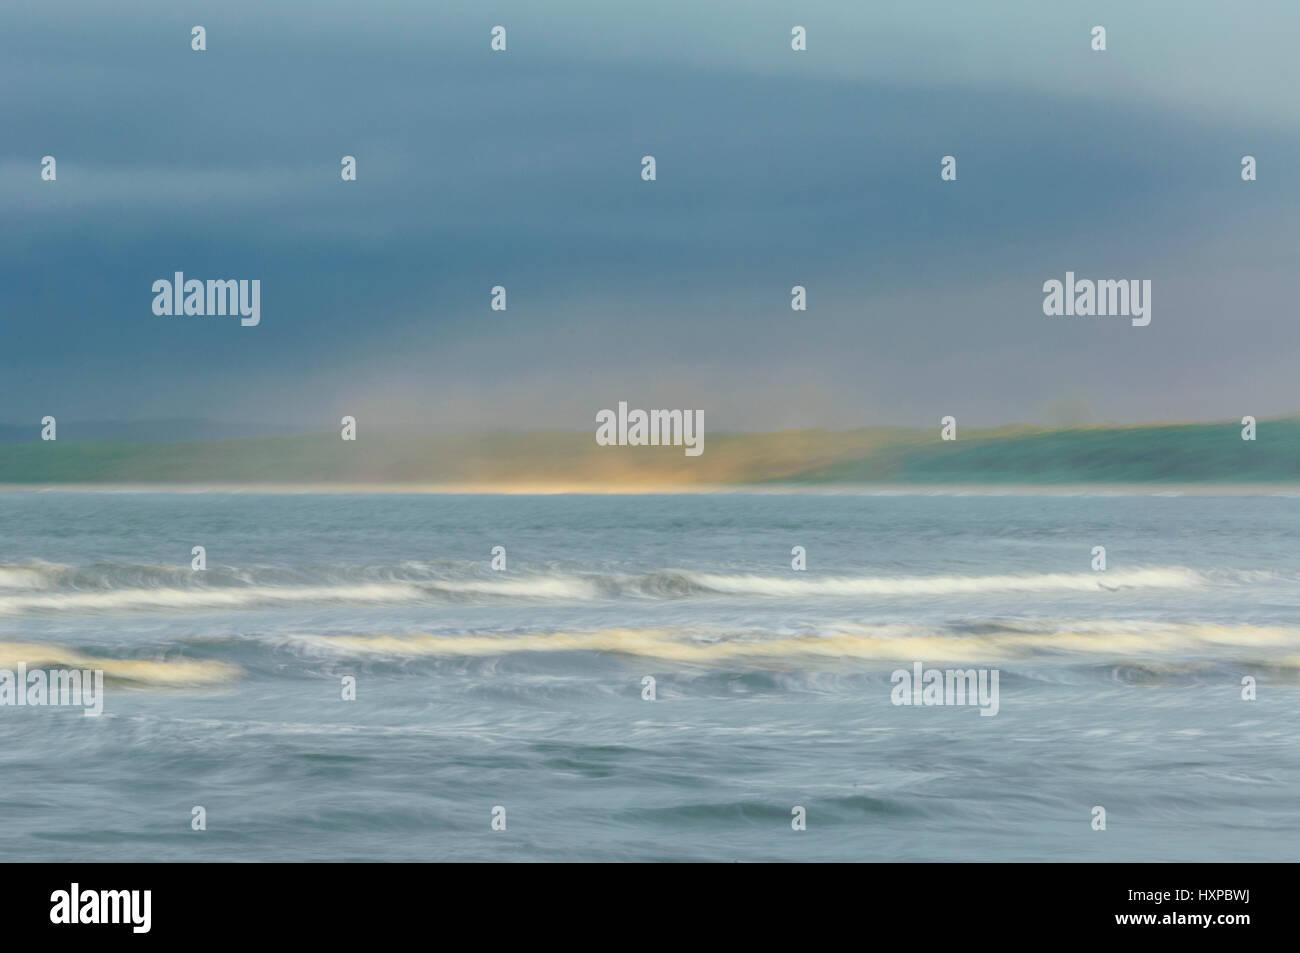 Ethereal view of Seven Mile Beach, Gerroa, Illawarra Coast, New South Wales, NSW, Australia - Stock Image